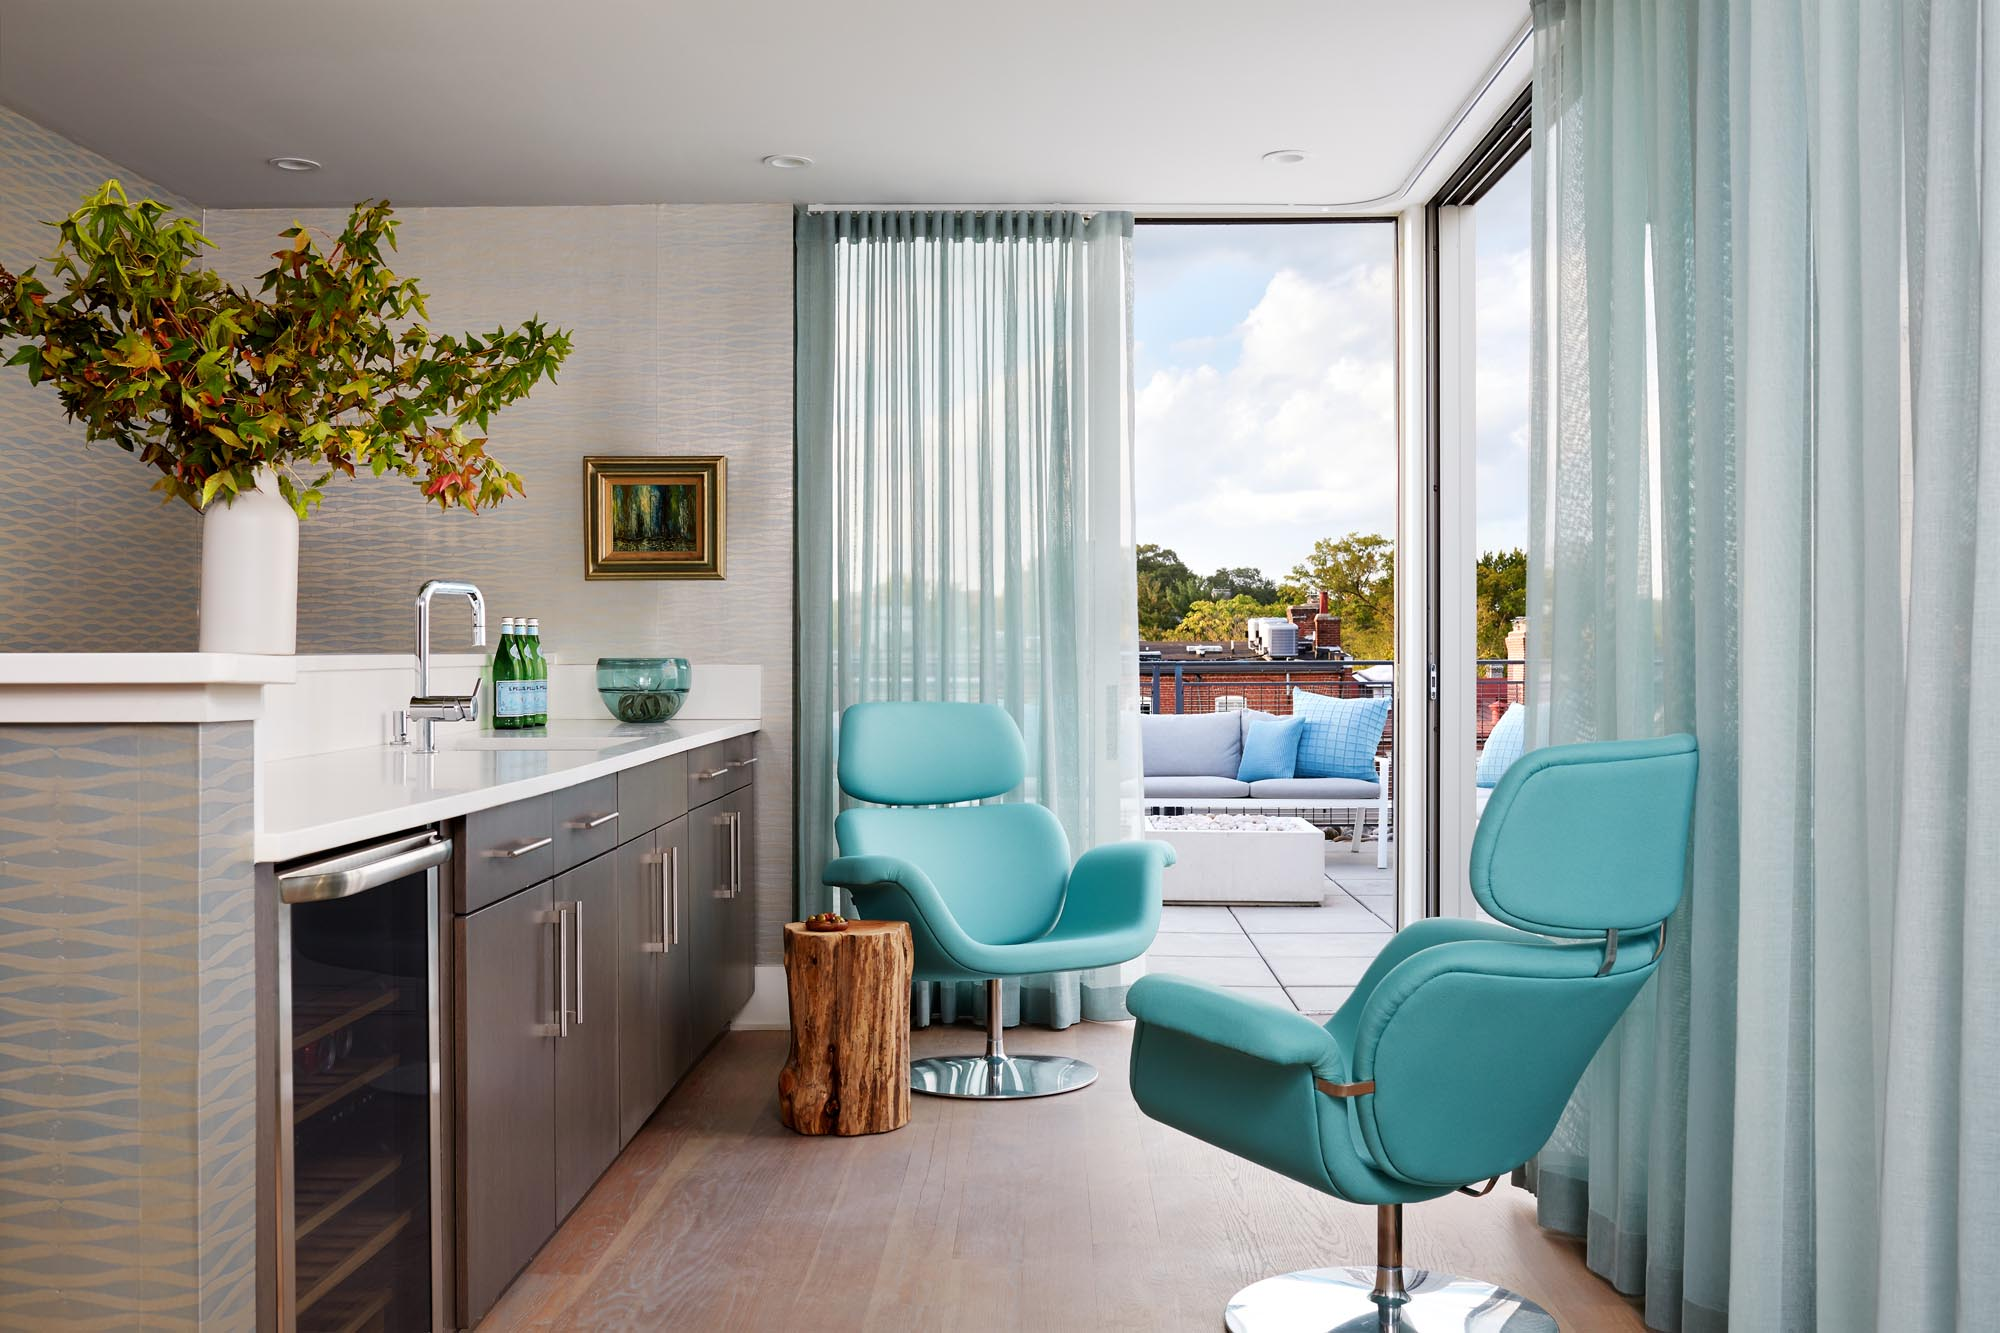 Boston lounge bar interior design by Dane Austin Design